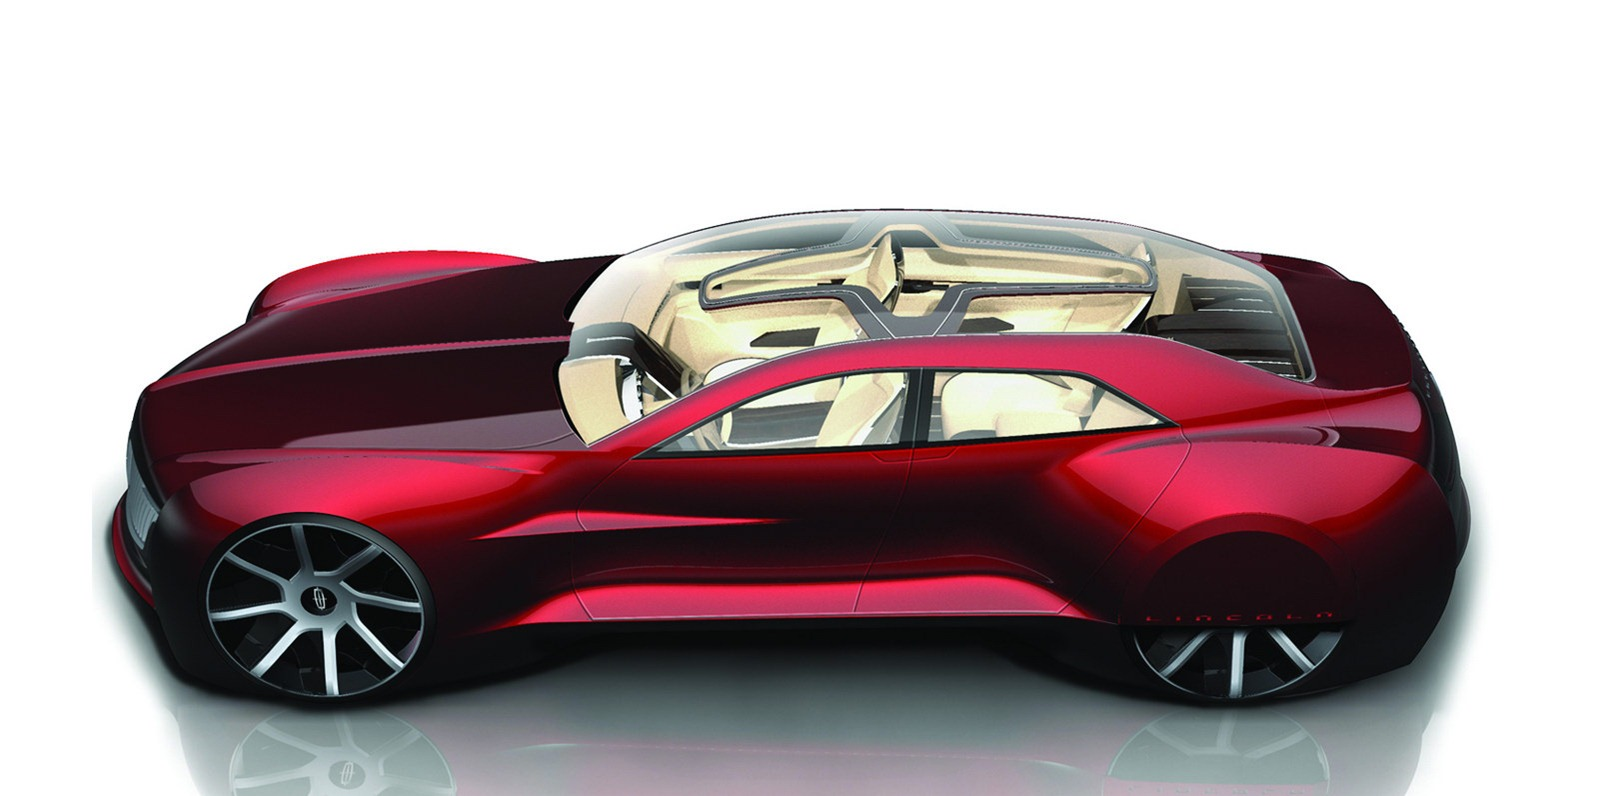 2025 Lincoln Continental Concept | AmcarGuide.com ...